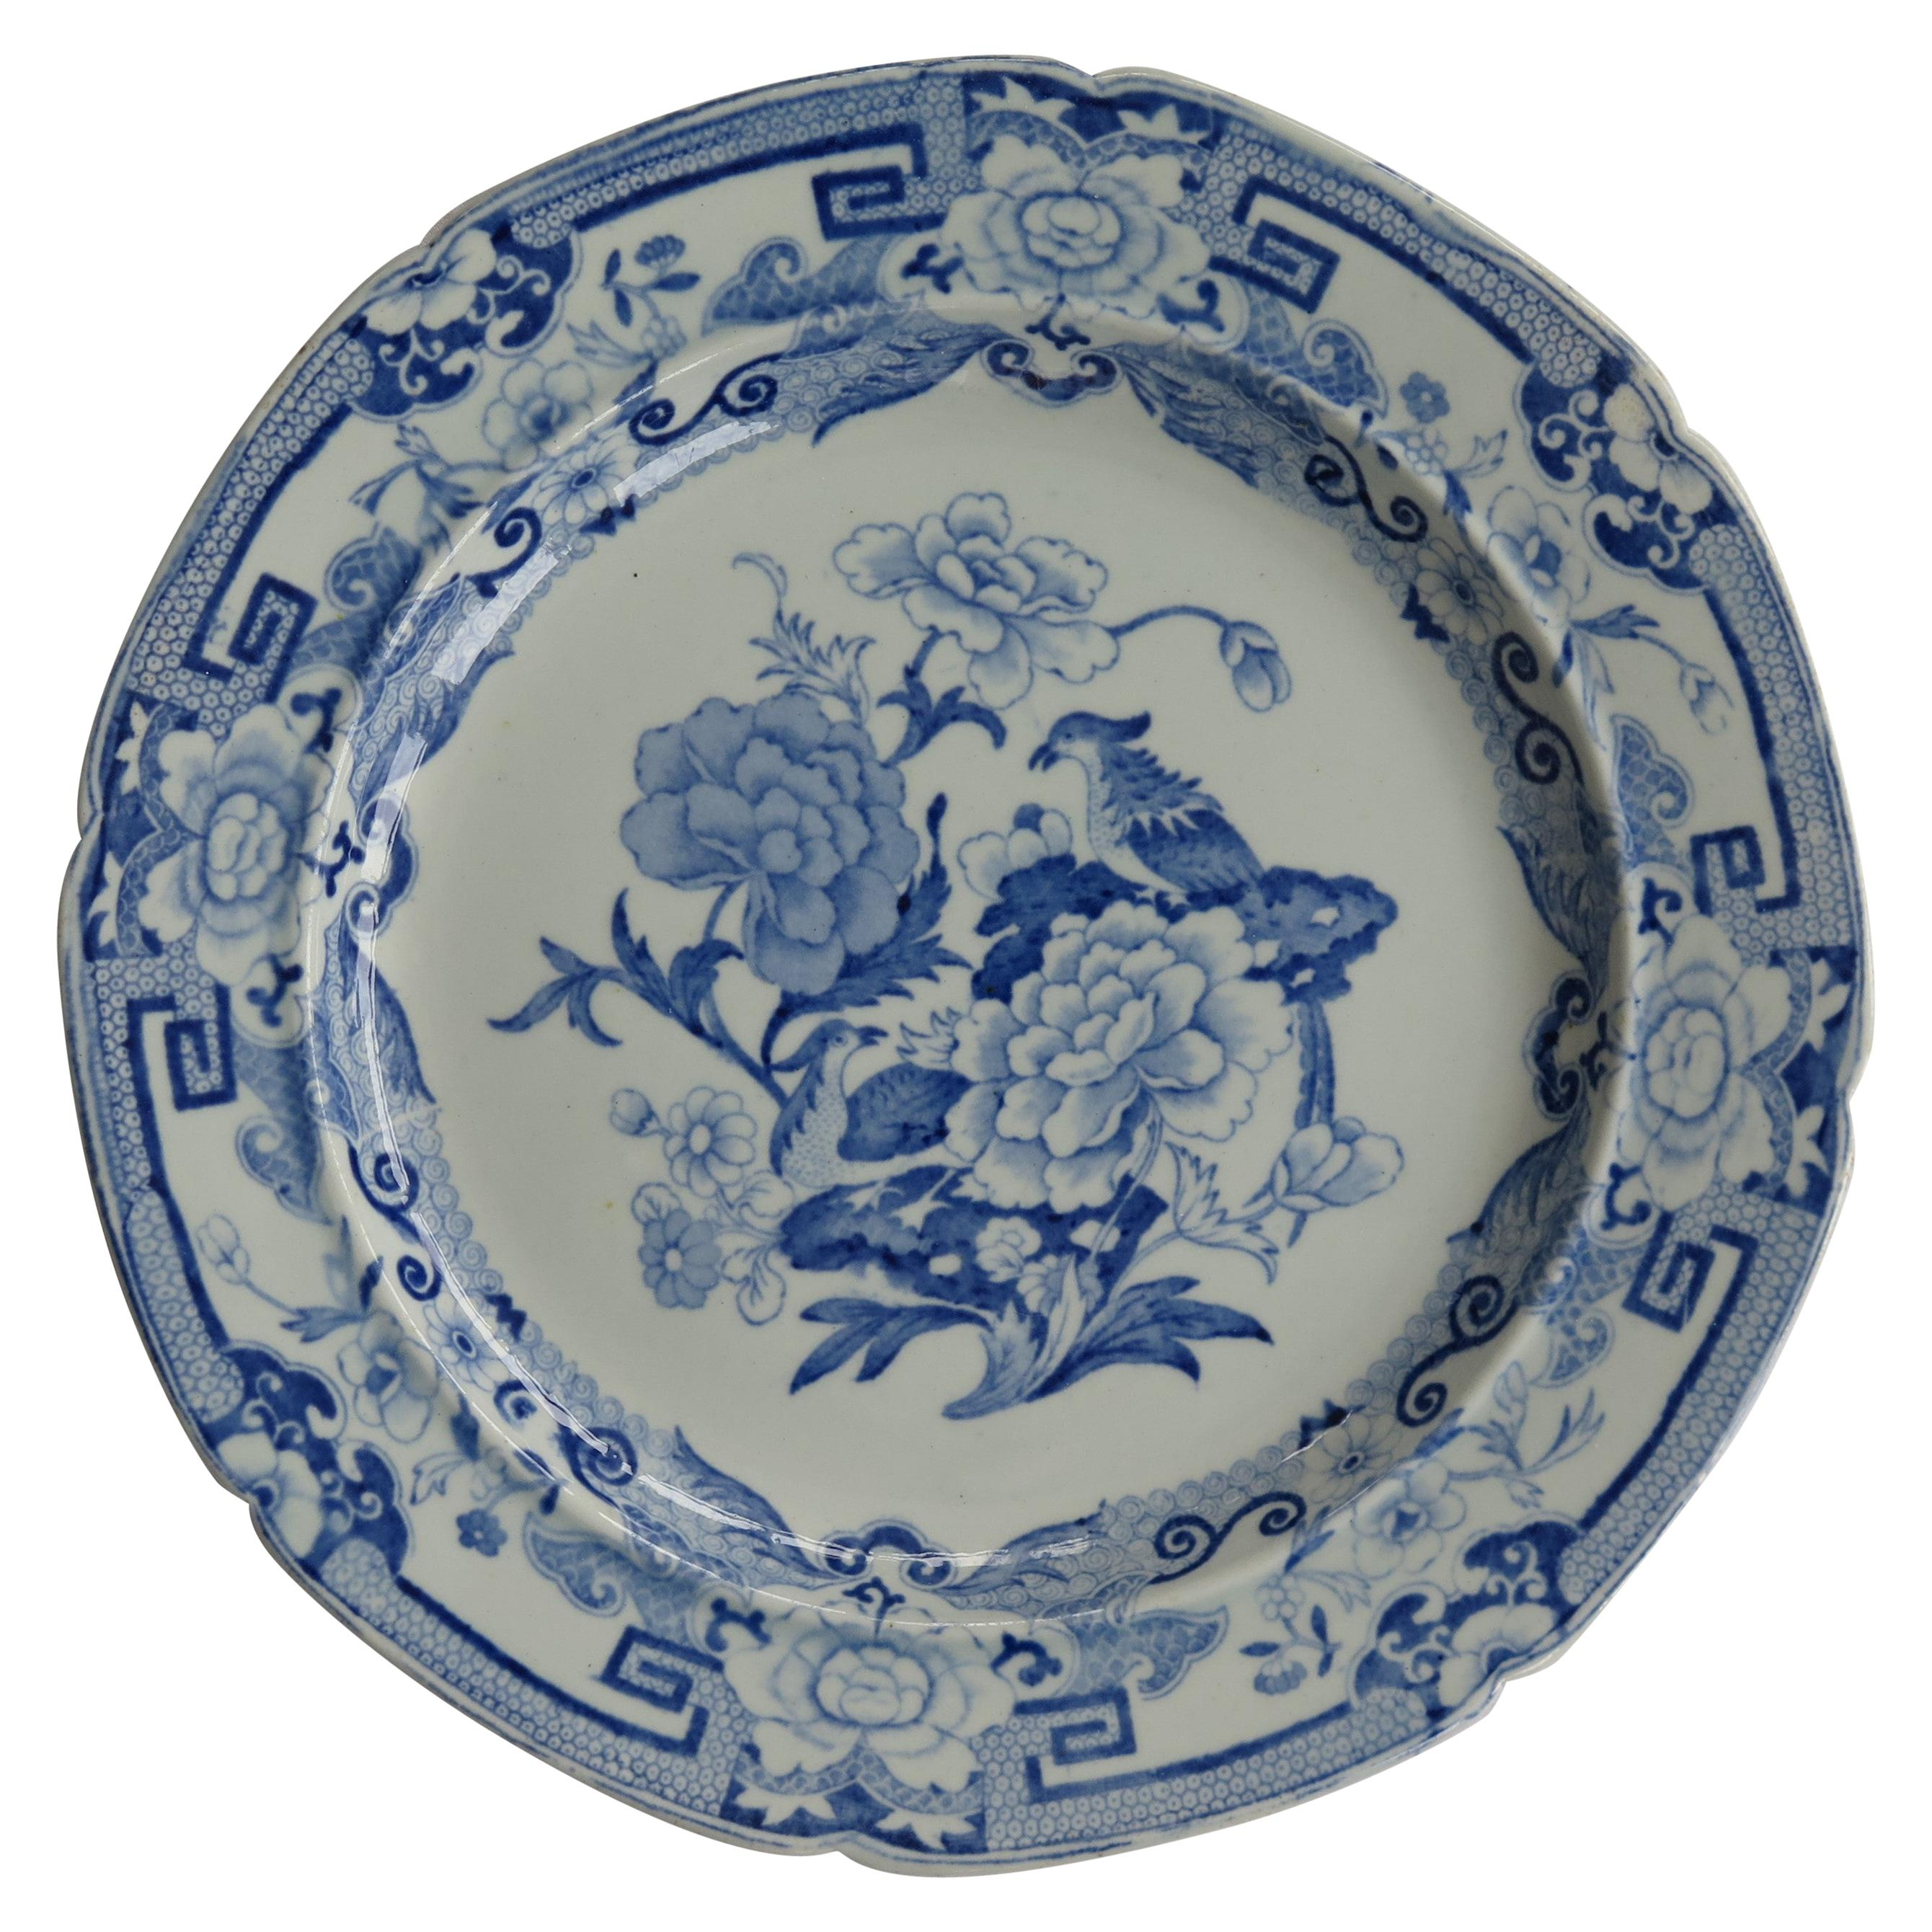 Masons Ironstone Dinner Plate in Blue India Pheasants Pattern, circa 1815